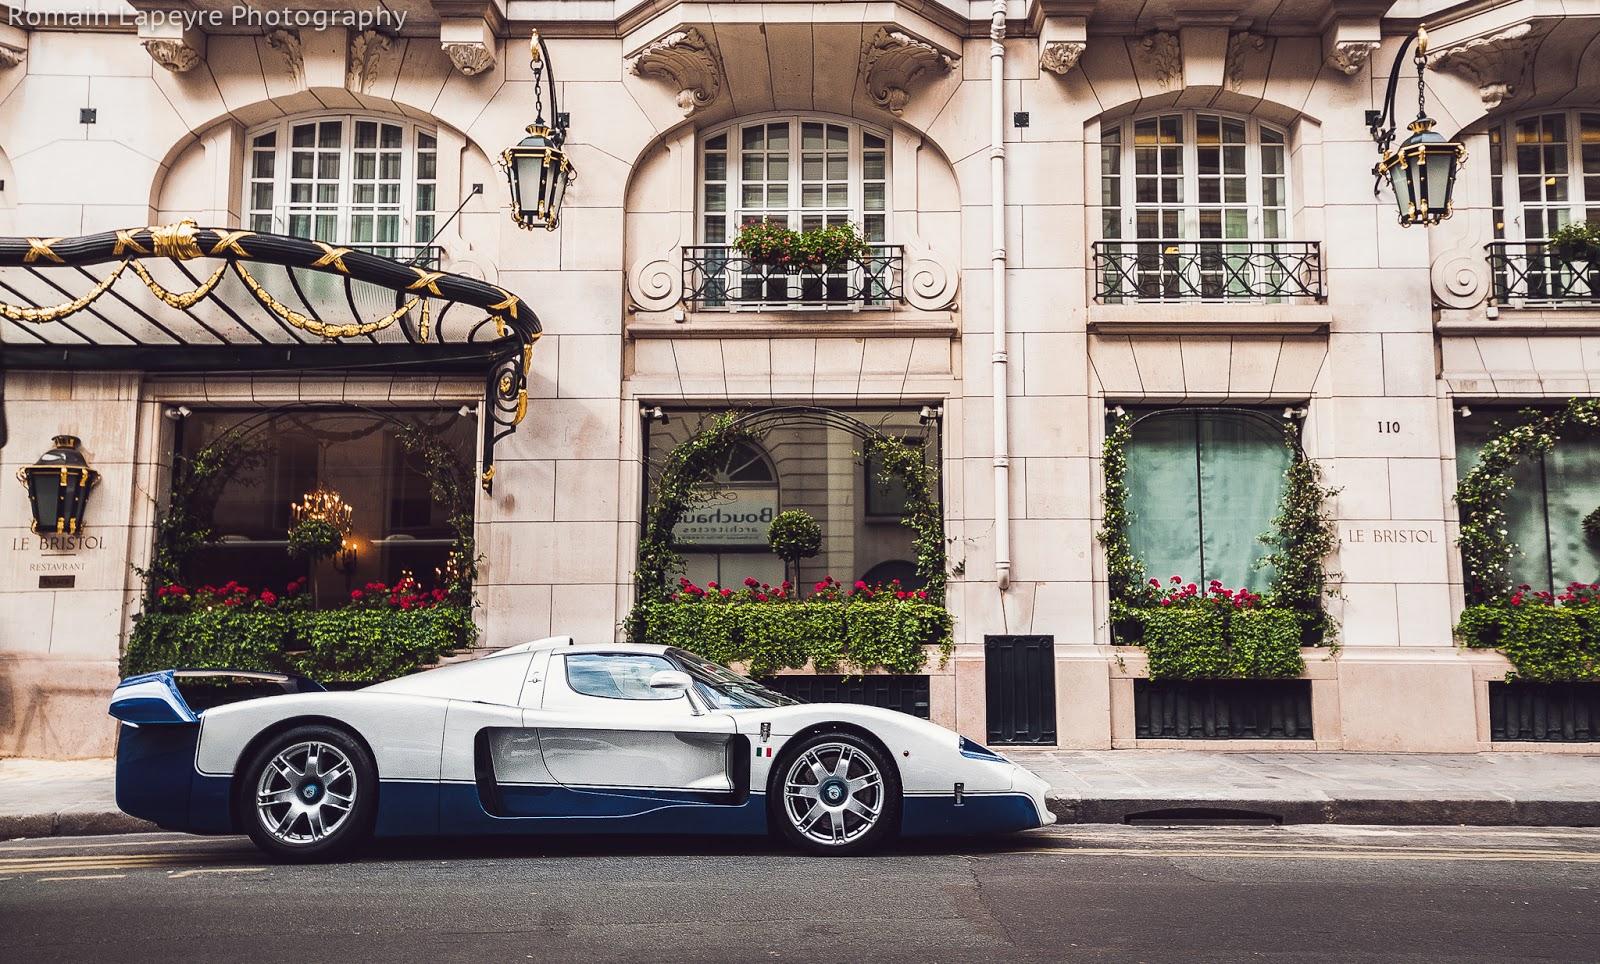 22919230893 2afe38f645 o Maserati MC12. Η Enzo Aperta. Maserati, Maserati MC12, MC12, retrocar, retrocar sunday, zblog